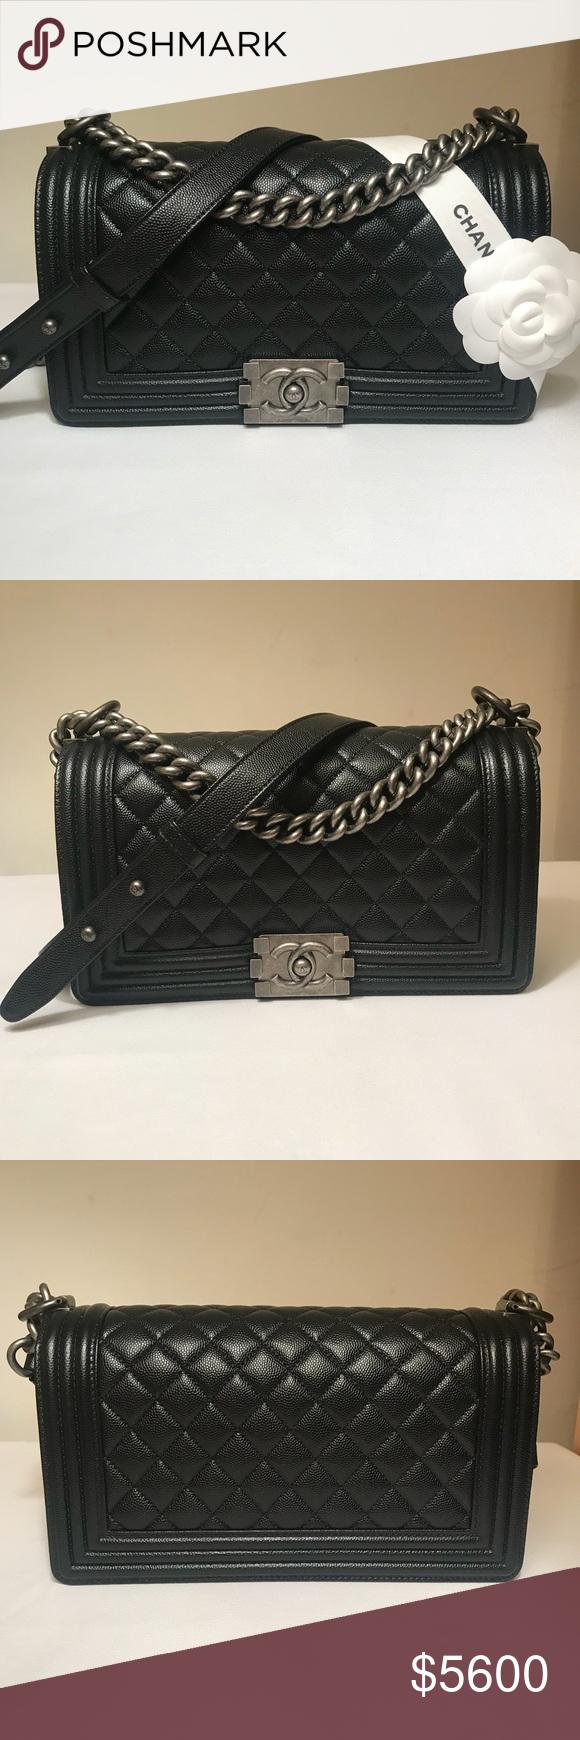 1828de522fad14 Chanel Caviar Boy Bag Old Medium with RHW Authentic Chanel Black Caviar  Quilted Boy Bag Old